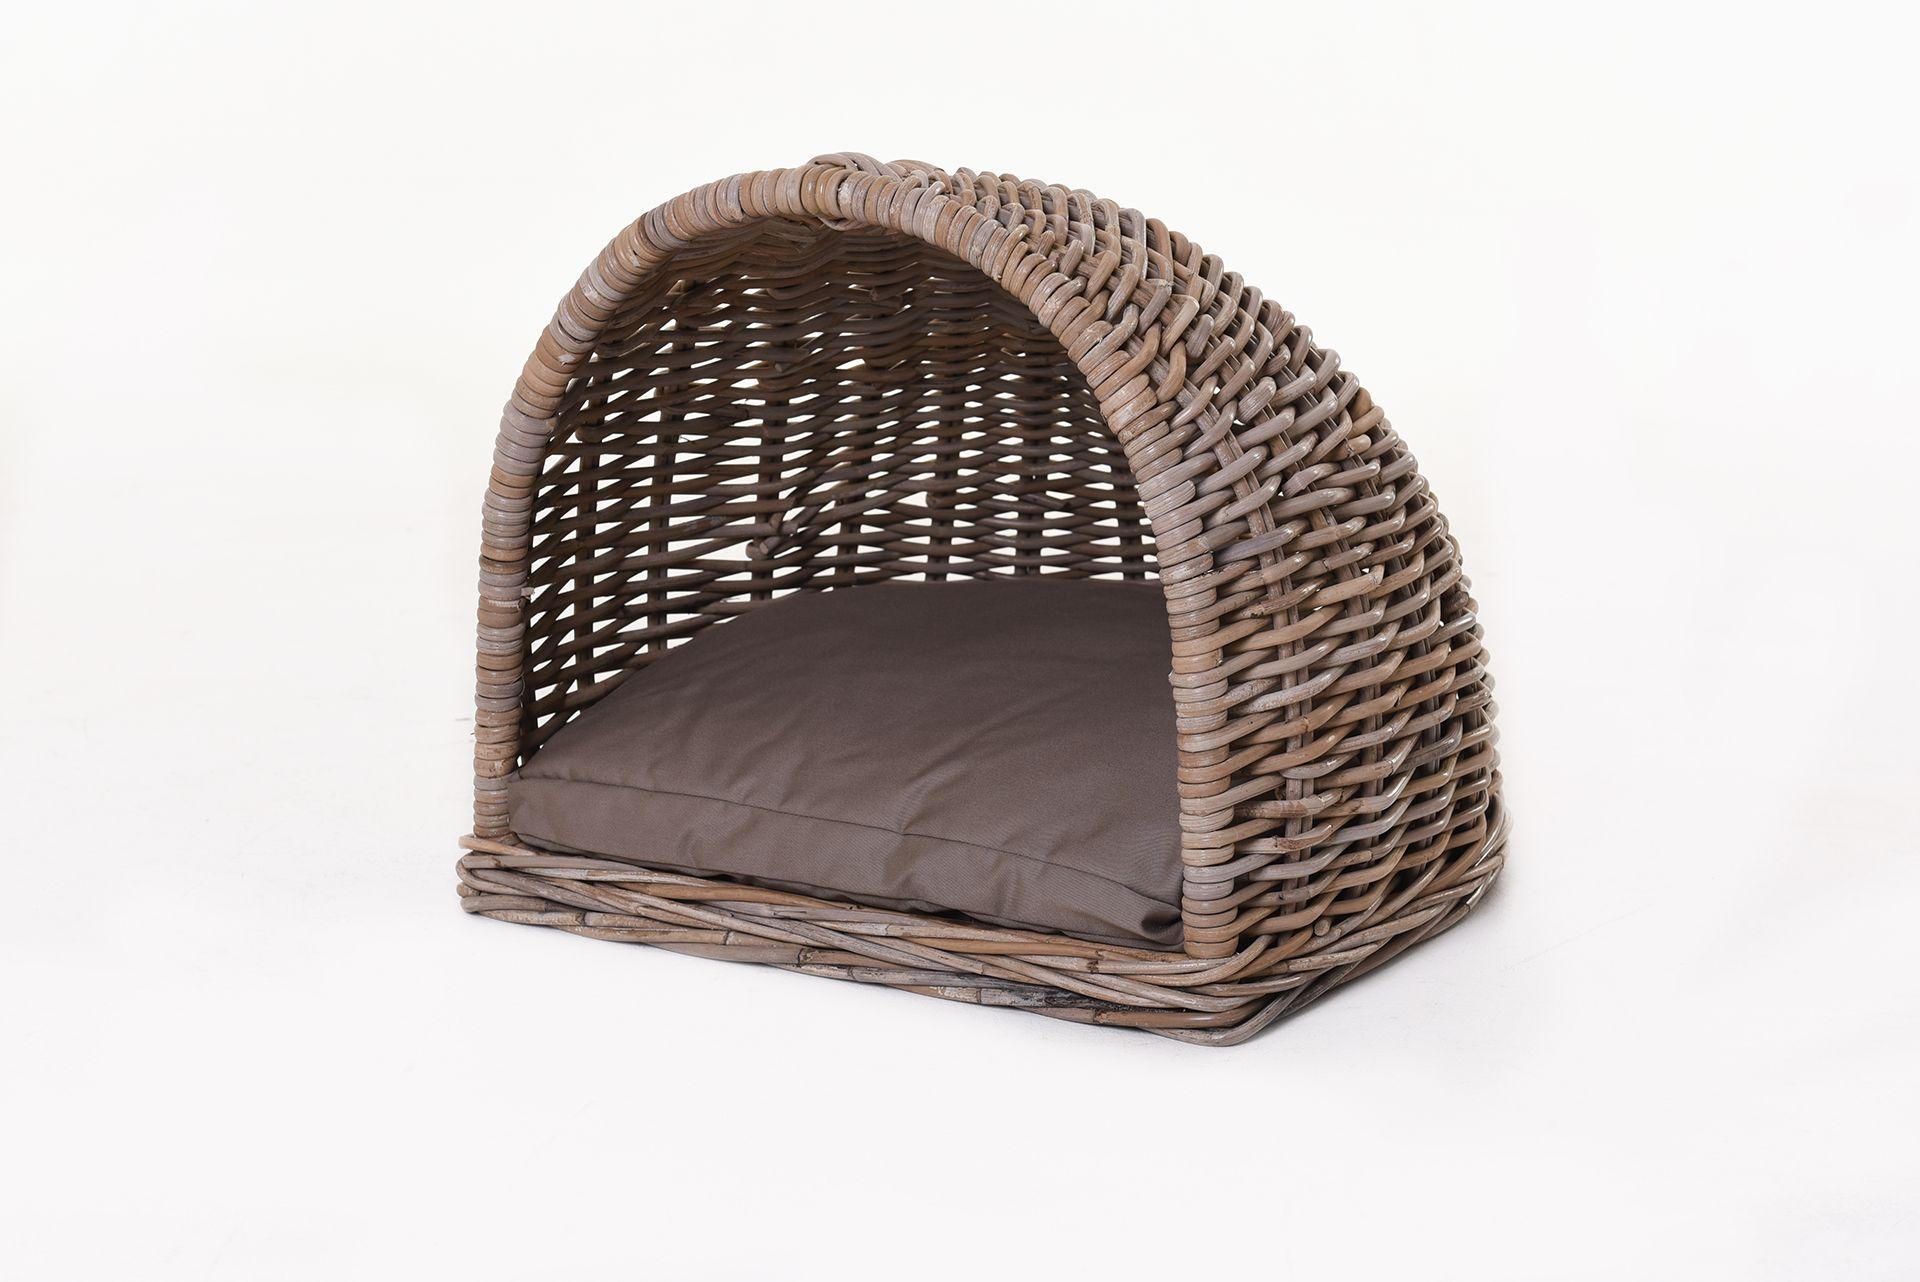 hundekorb katzenkorb halbrund mit kissen jappo rattan koobo grey ebay. Black Bedroom Furniture Sets. Home Design Ideas